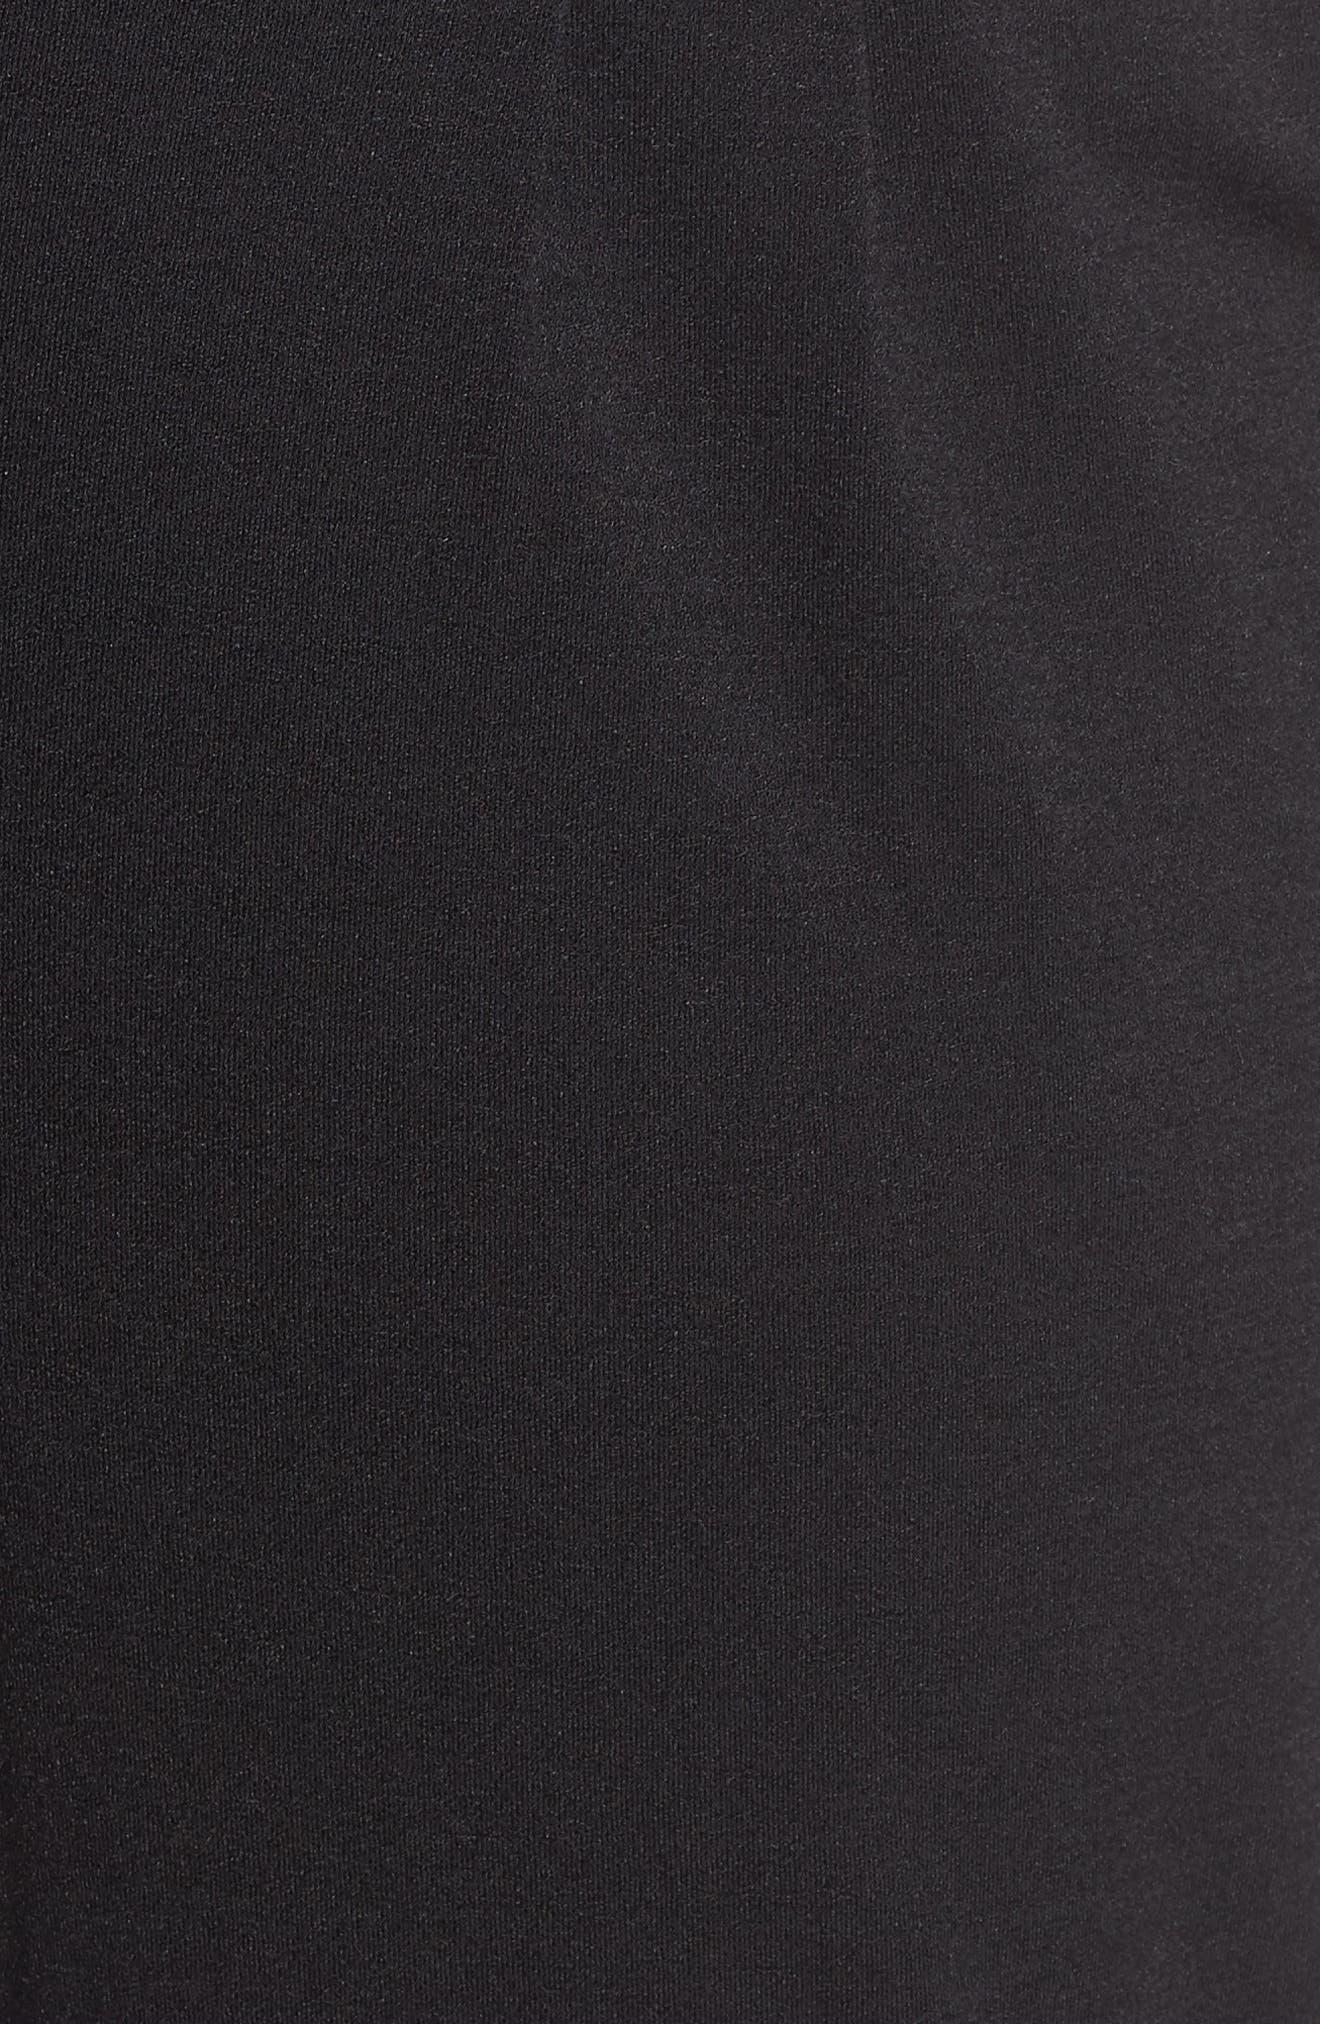 LEMON TART,                             Jesse High Rise Crop Pants,                             Alternate thumbnail 5, color,                             BLACK